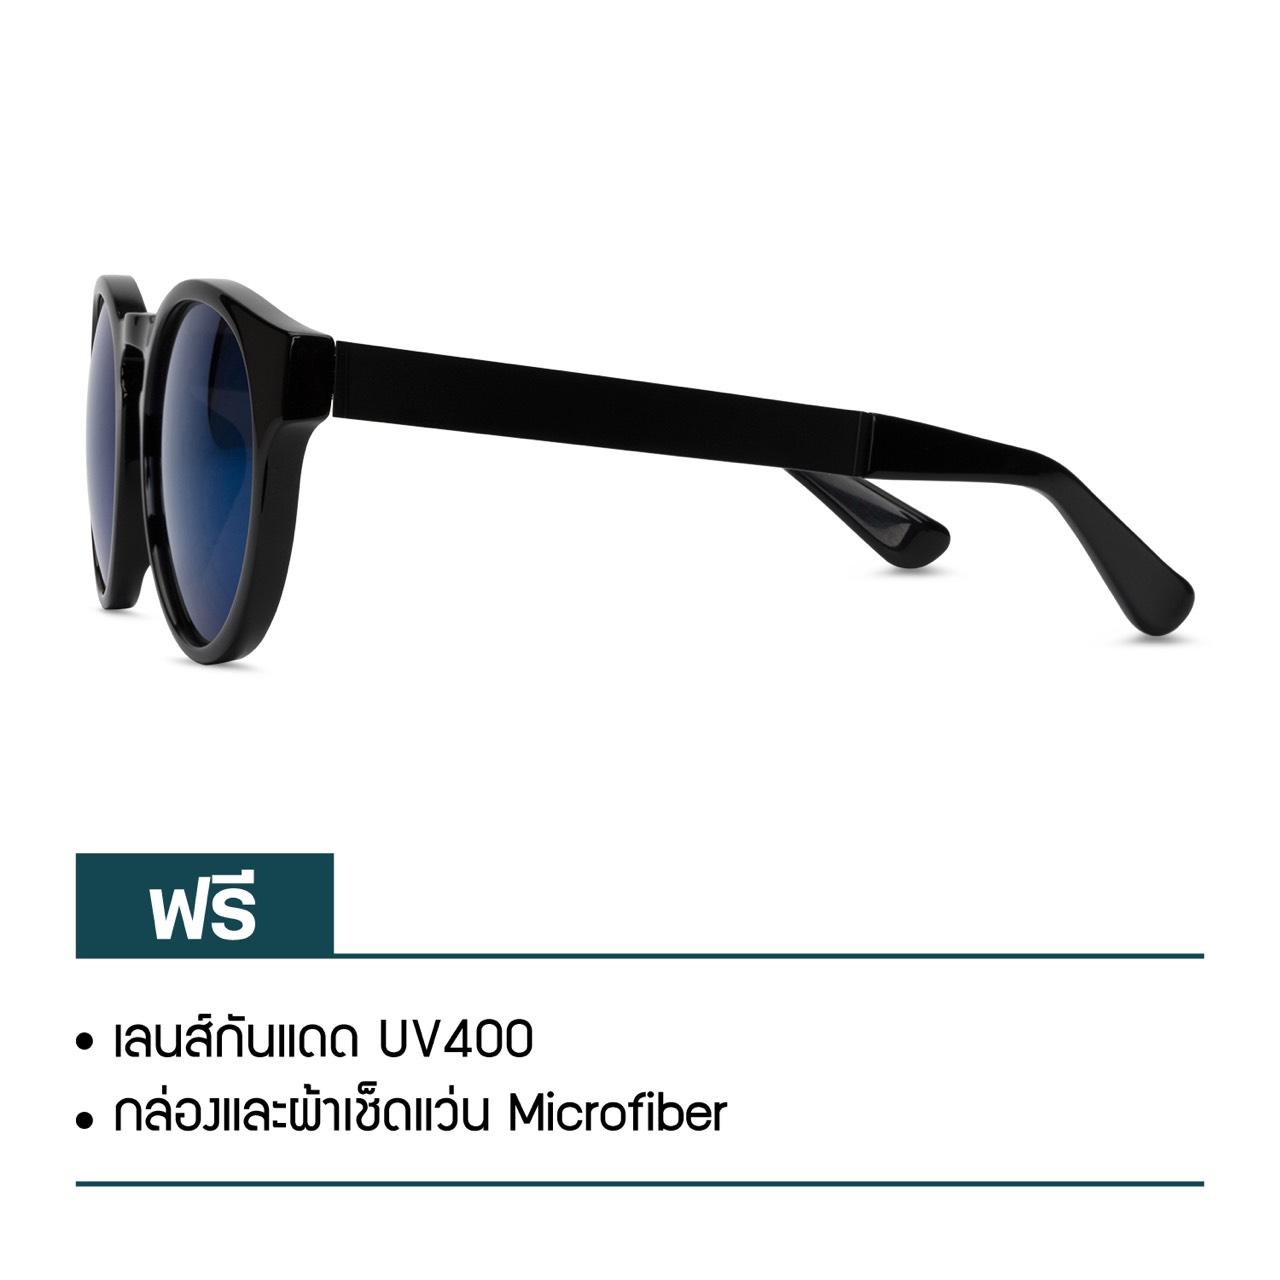 Glazziq,Sunglasses,แว่น,แว่นกันแดด,แว่นตา